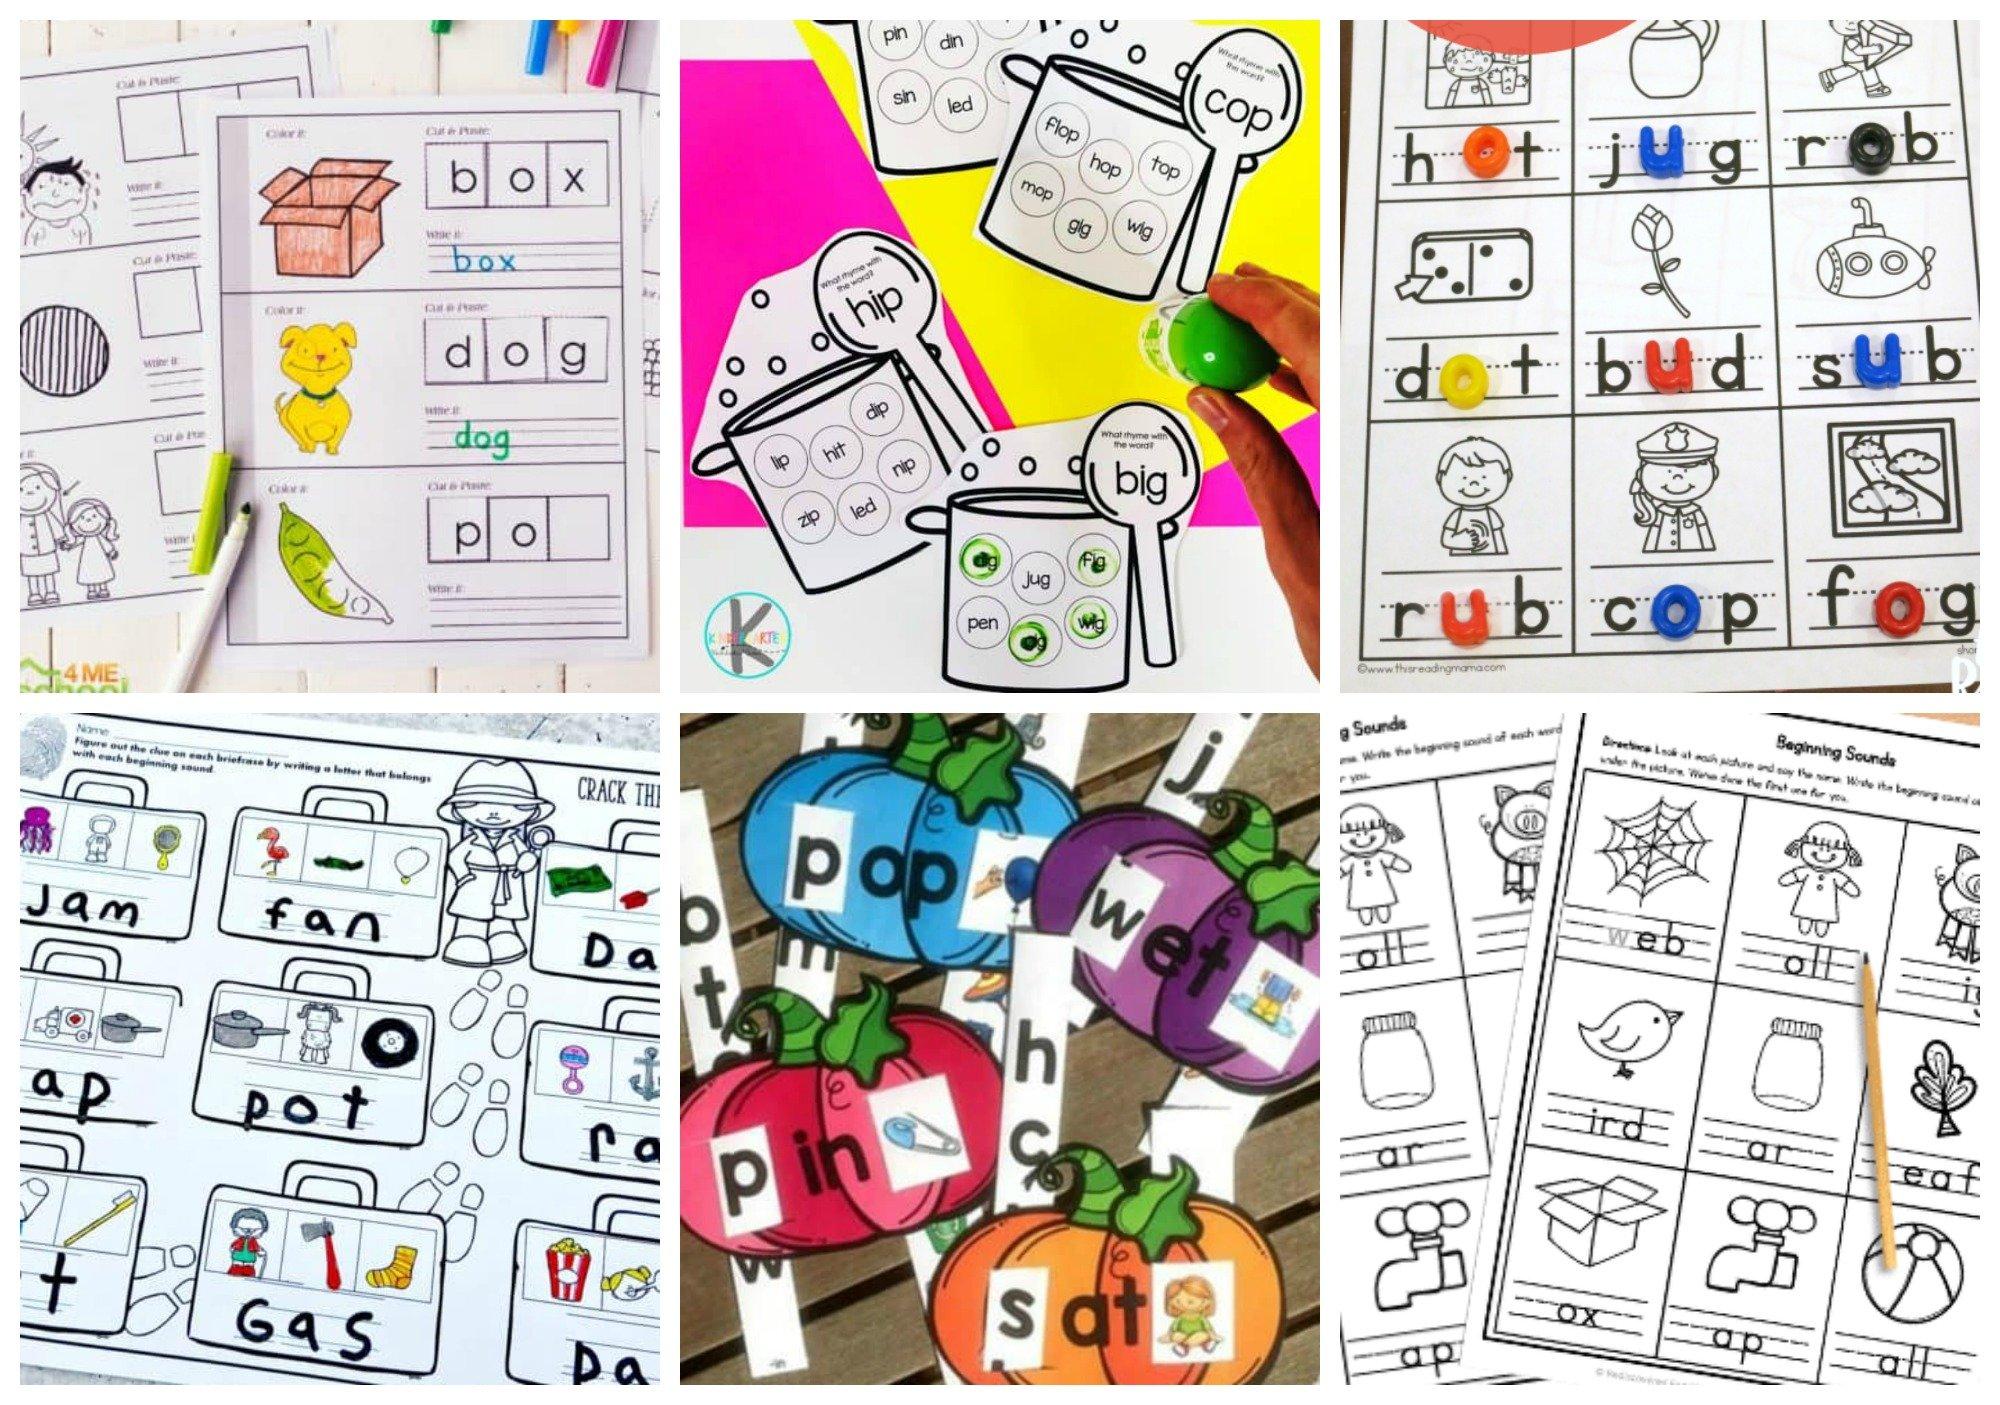 lots of fun free printable cvc worksheets for teaching preschool, pre-k, kindergarten, and first grade students